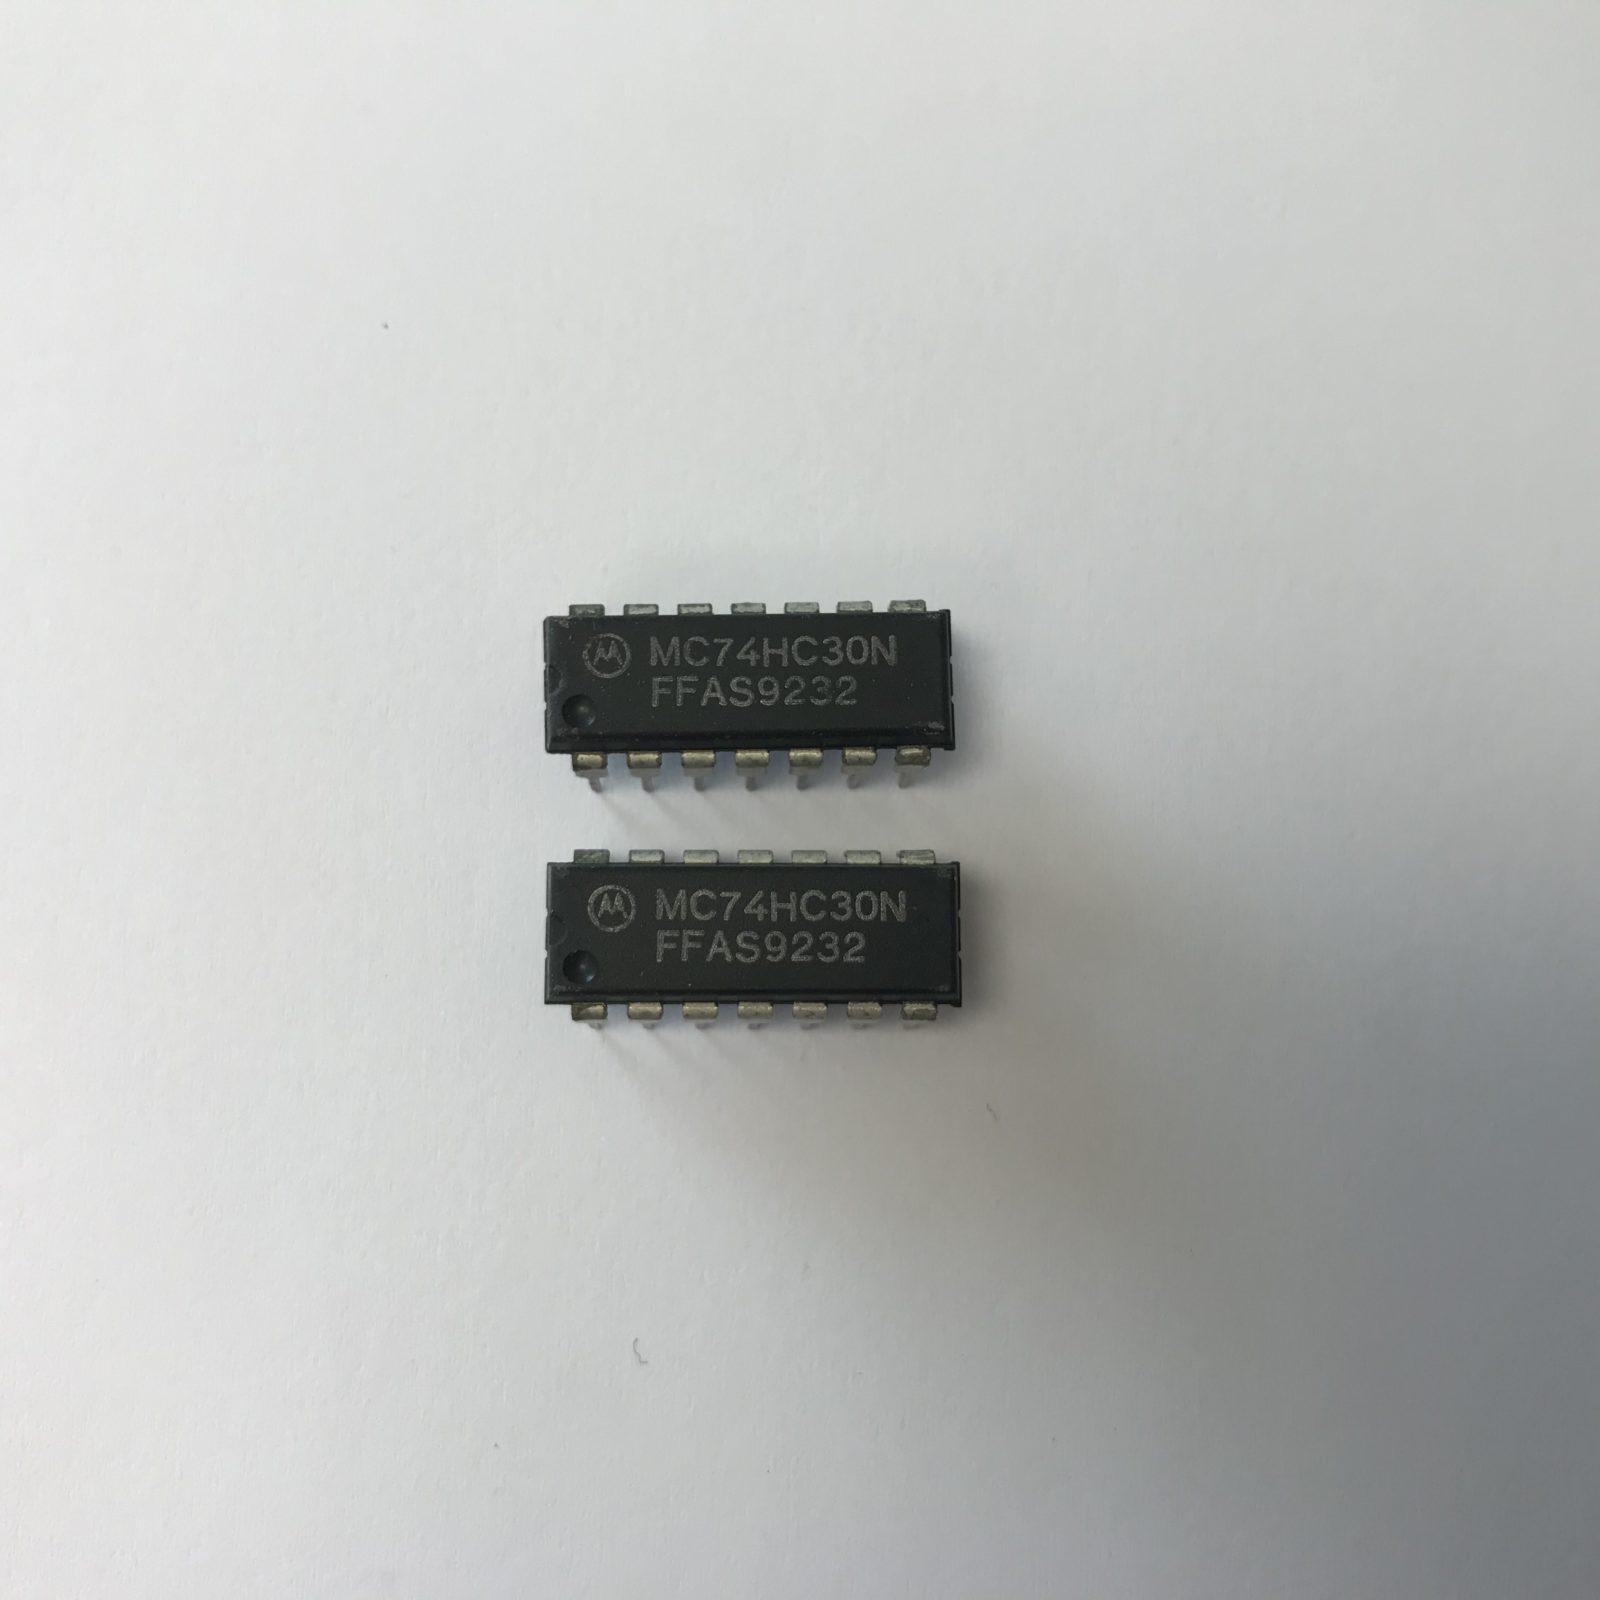 Details About Mc74hc30n Motorola 8 Input Nand Gate Ic New X2pcs 7400 Quad 2input Pin Layout